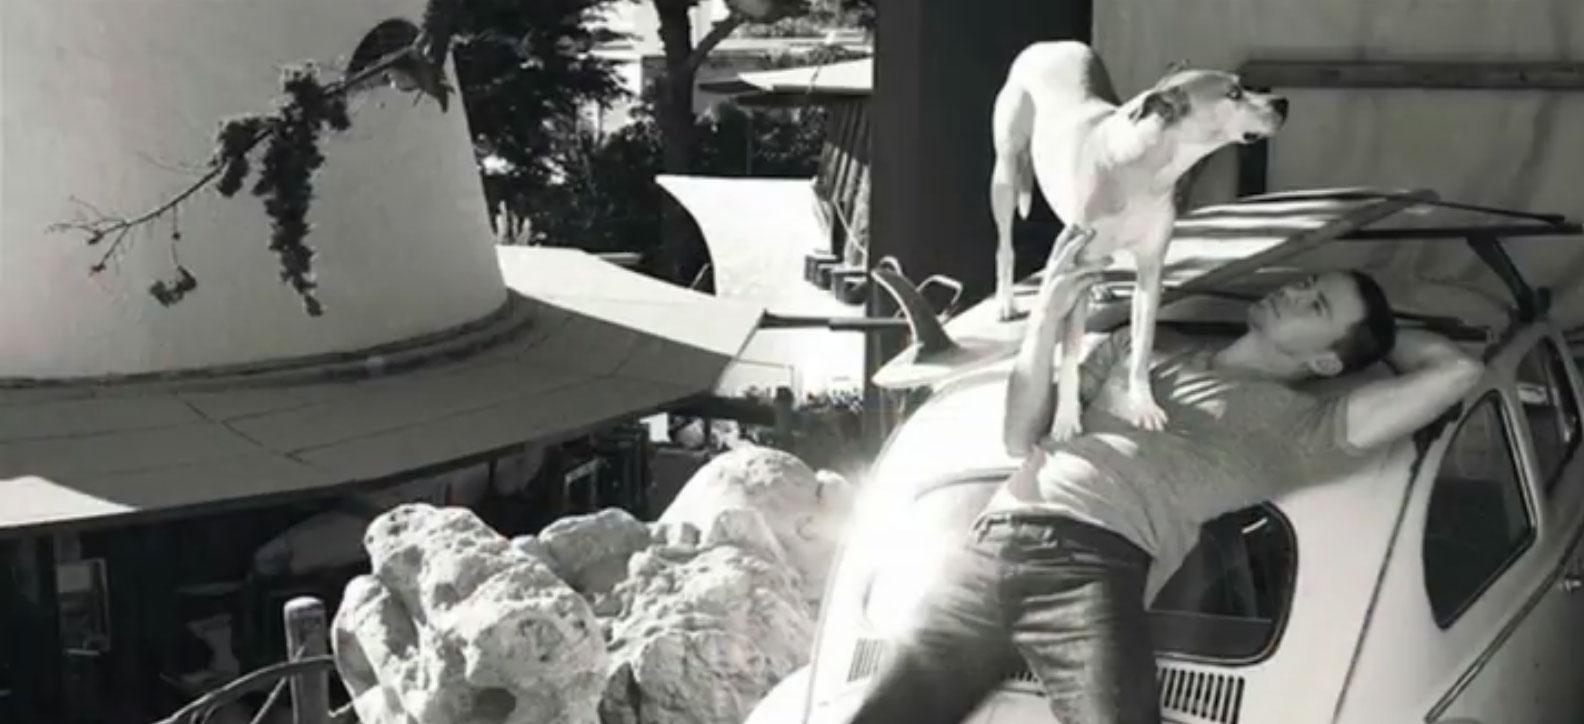 ChanningTatum-Details-BehindTheScenes-08.jpg